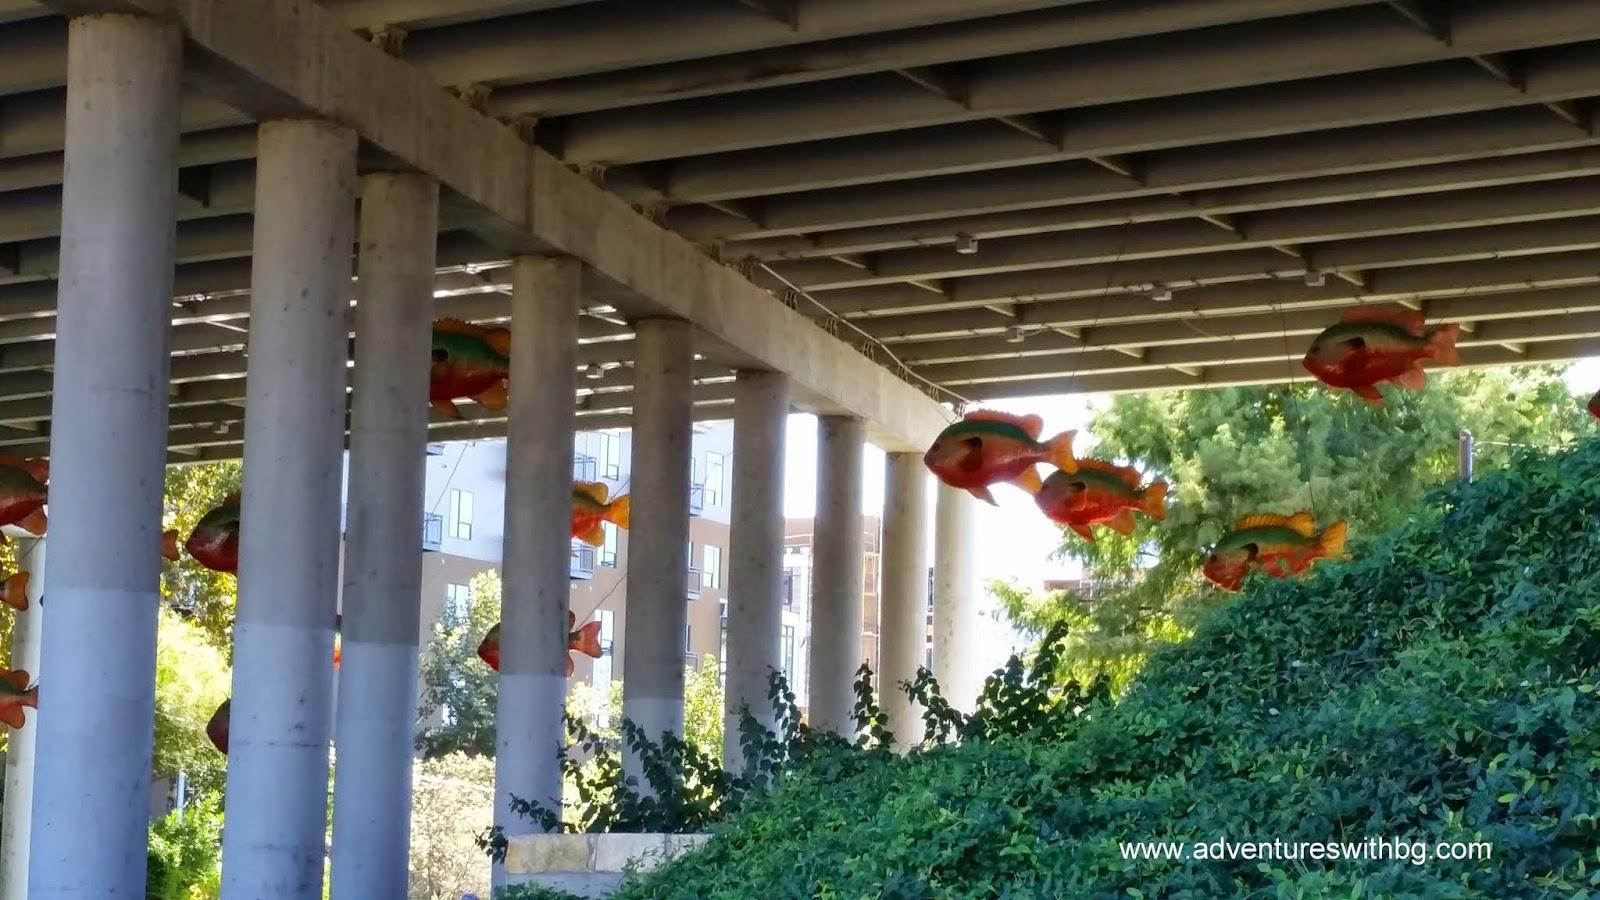 F.I.S.H. under the Interstate 35 bridge